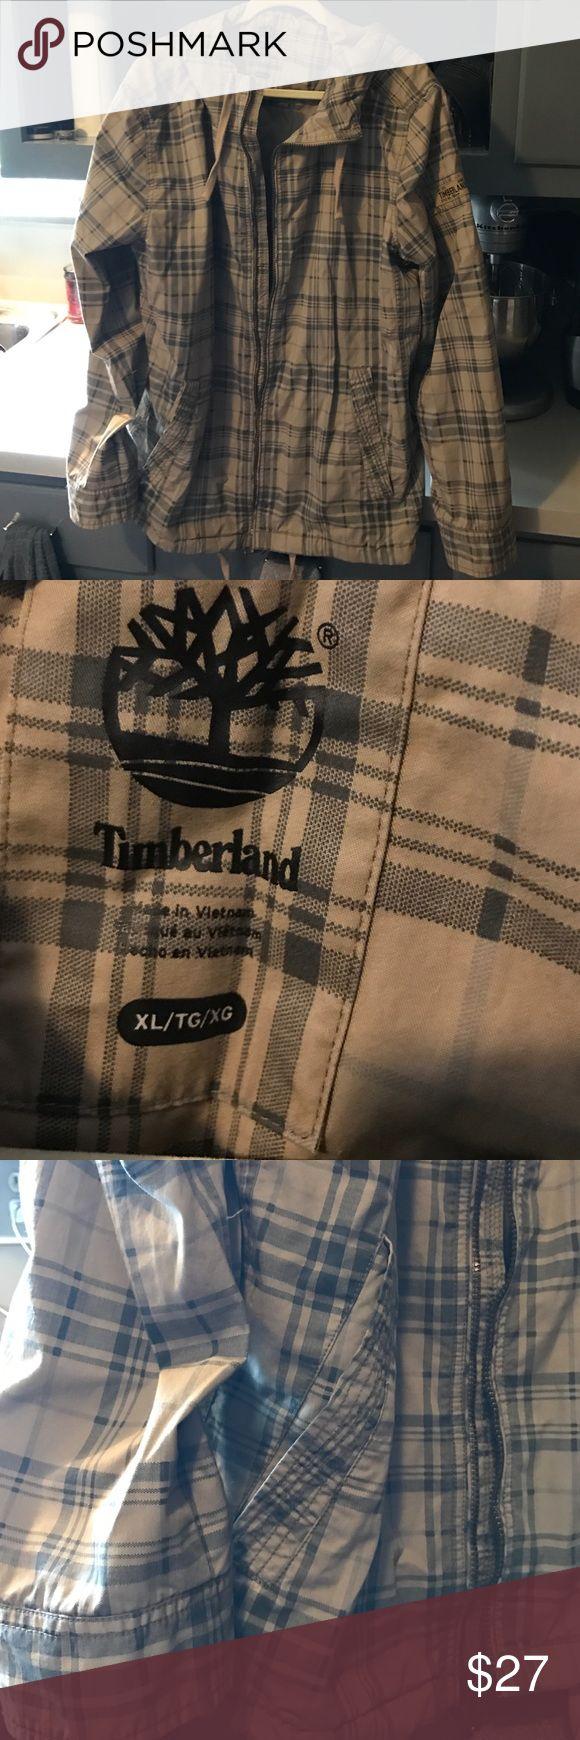 Timberland XL plaid Jacket. NEW, Neverworn Timberland XL jacket.  Mens Xl, plaid, hooded, lightweight jacket.  Brand new, never worn.  Original owner, smoke free home Timberland Jackets & Coats